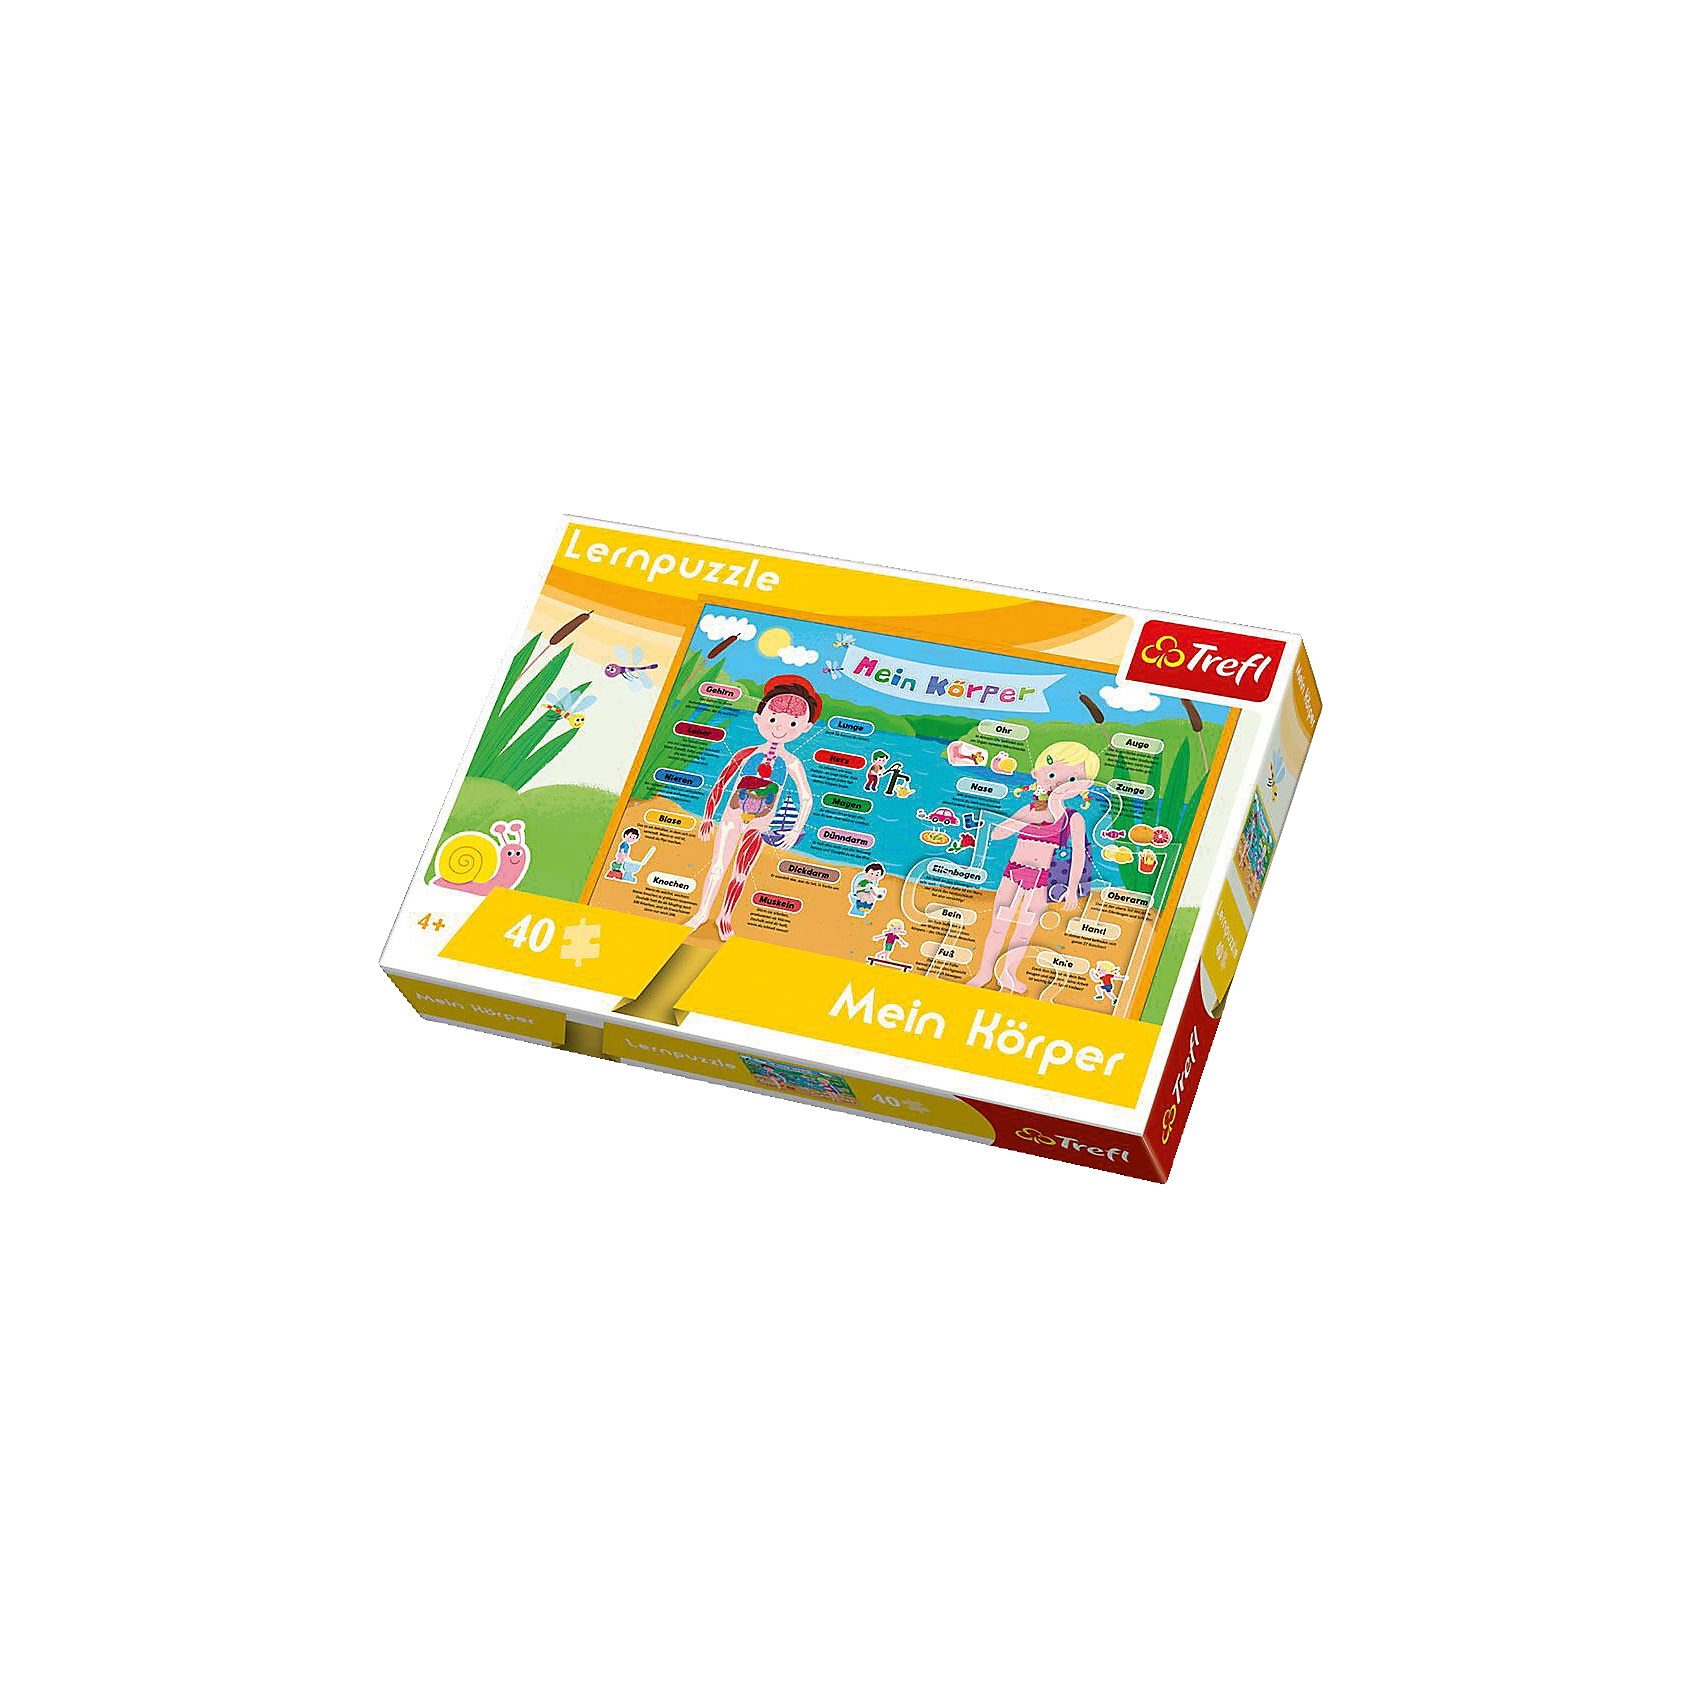 Trefl Lernpuzzle 40 Teile - Mein Körper